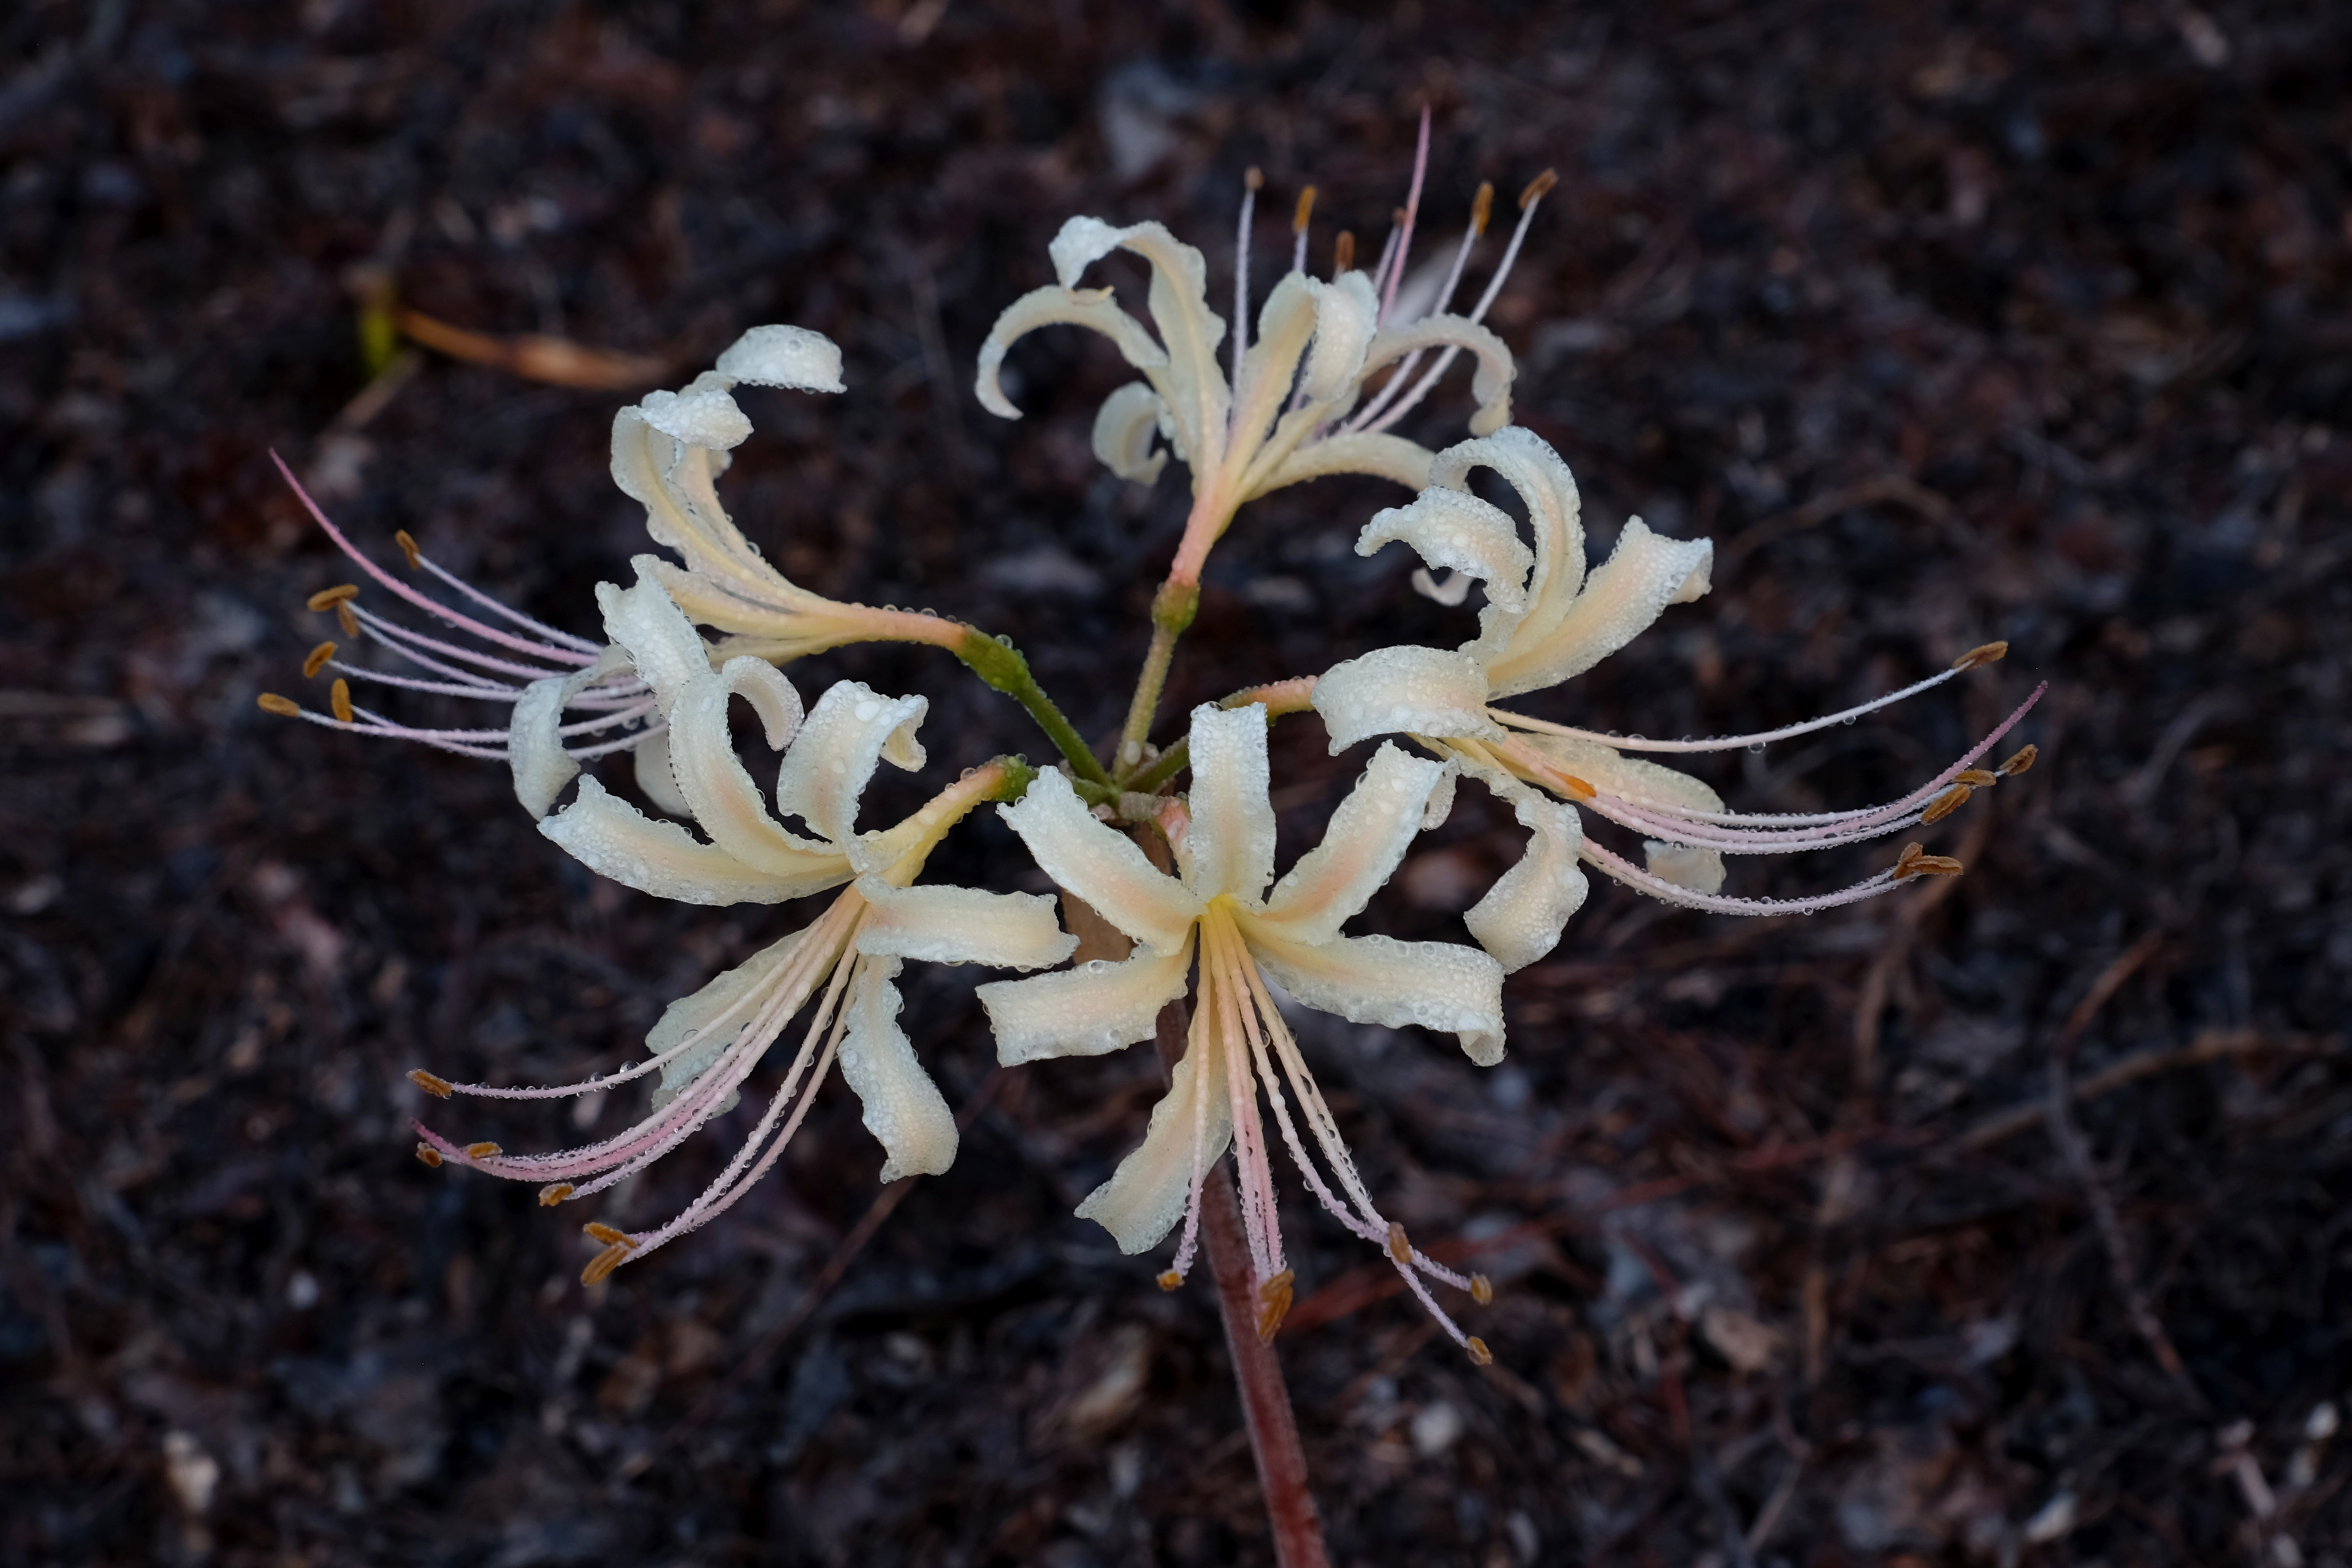 Lycoris x albiflora 'Marshall's Fertile' @ JLBG - a Betty Marshall hybrid of Lycoris aurea x radiata - named by Adams